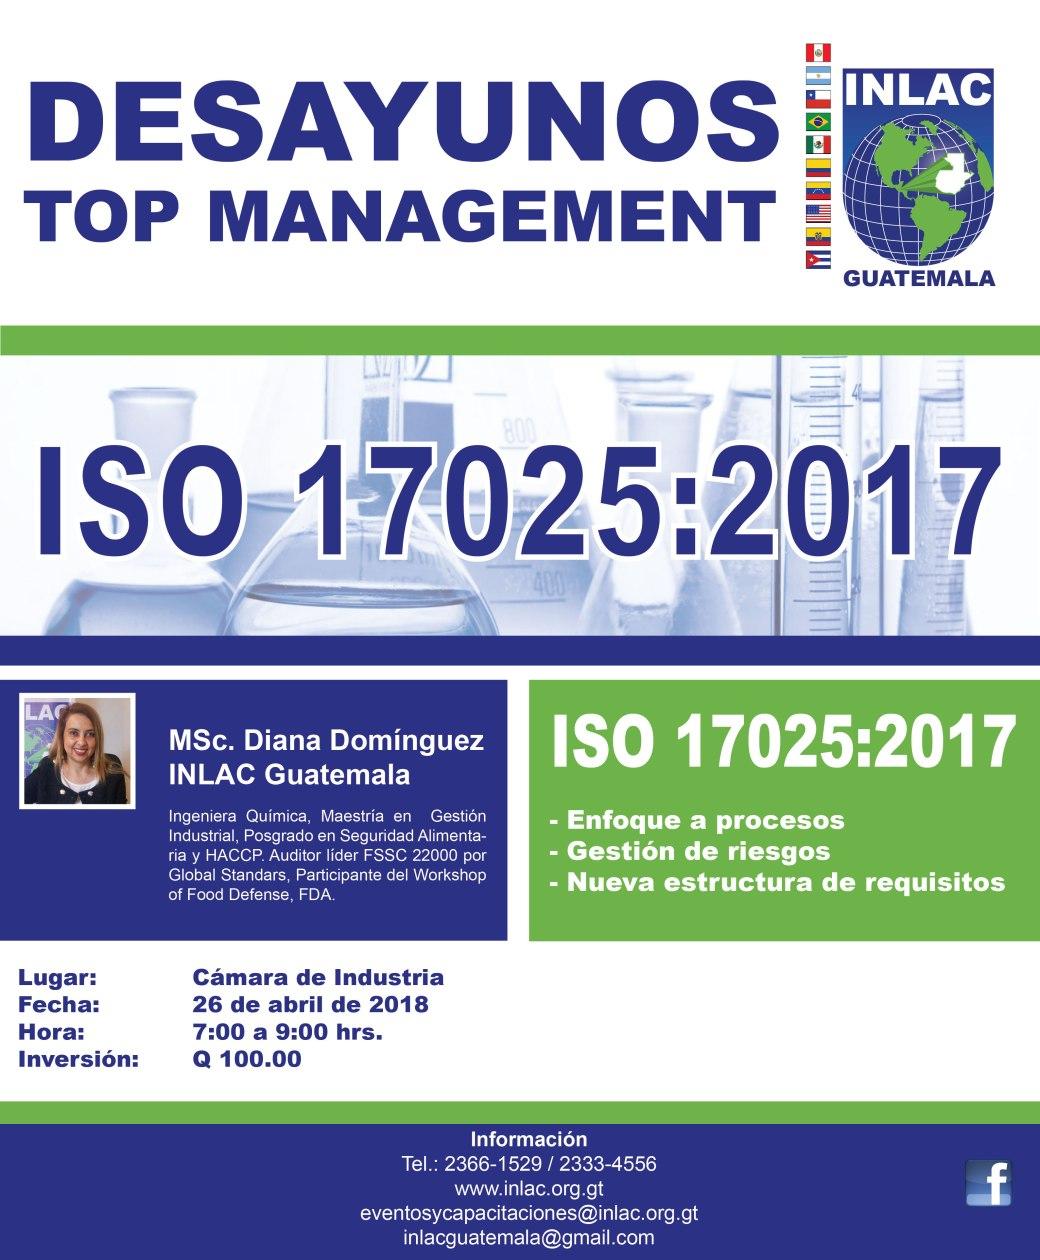 Desayuno 2 - ISO 17025 2017.jpg